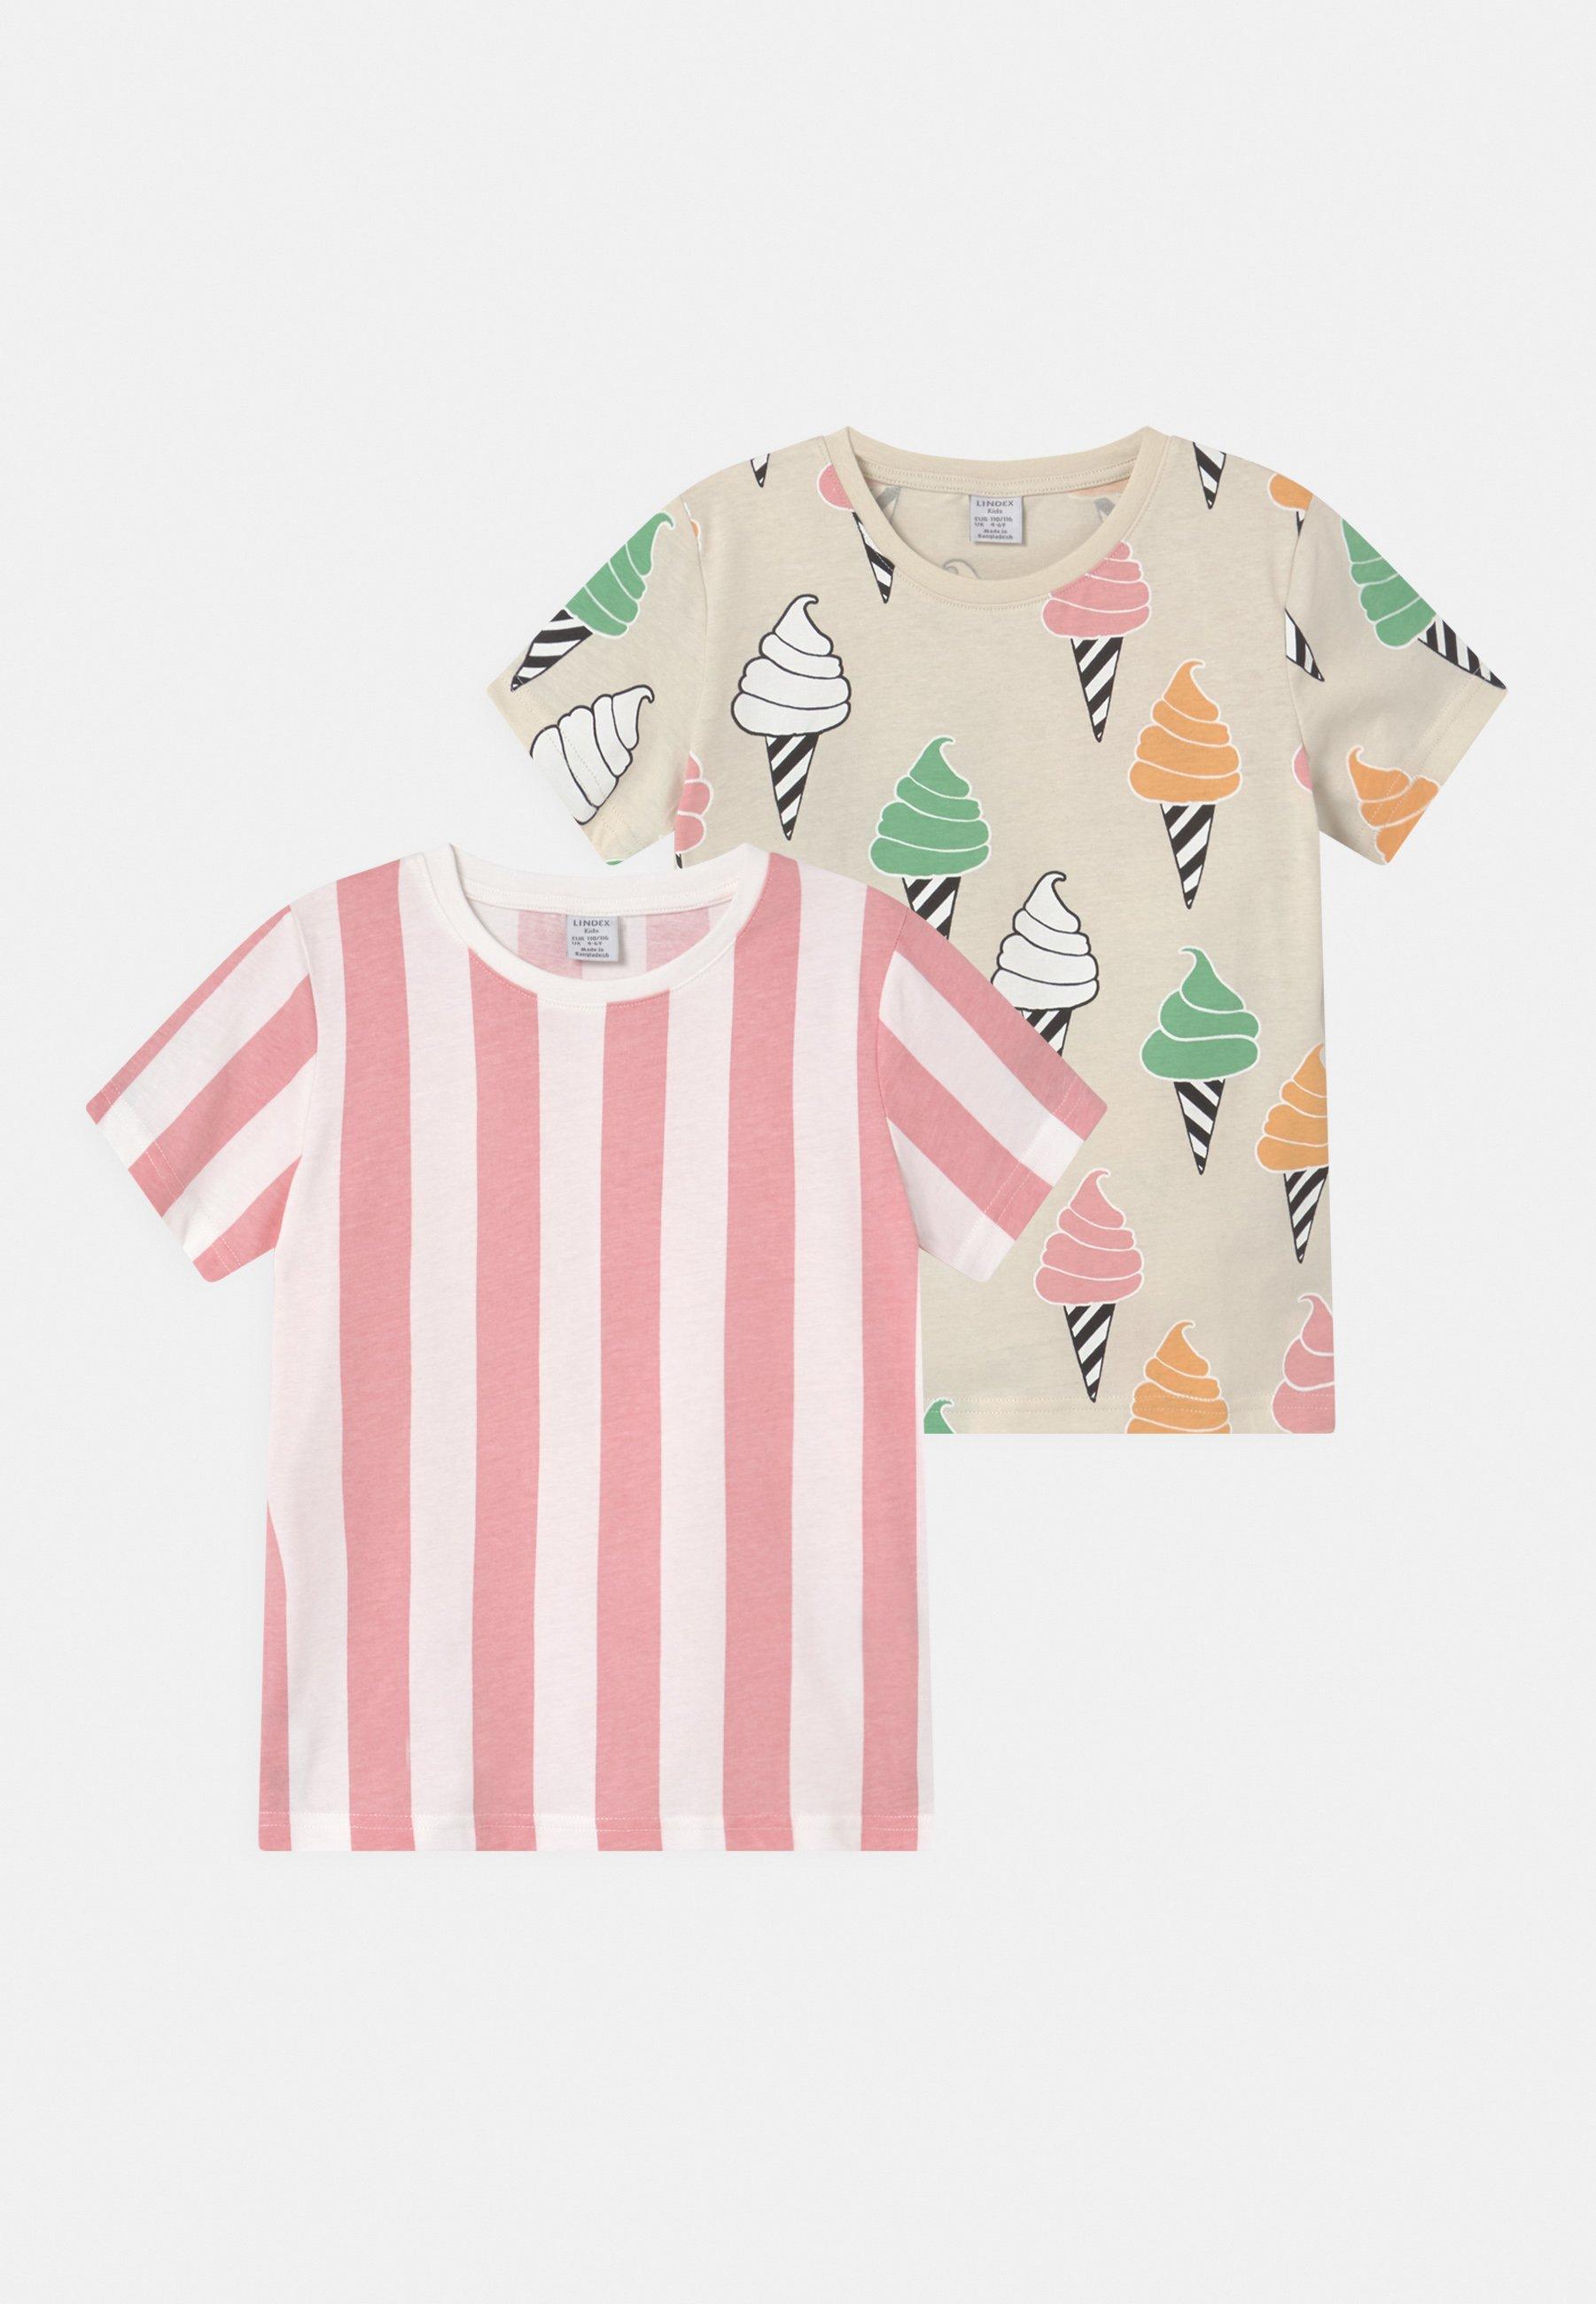 Bambini MINI ICE CREAM 2 PACK UNISEX - T-shirt con stampa